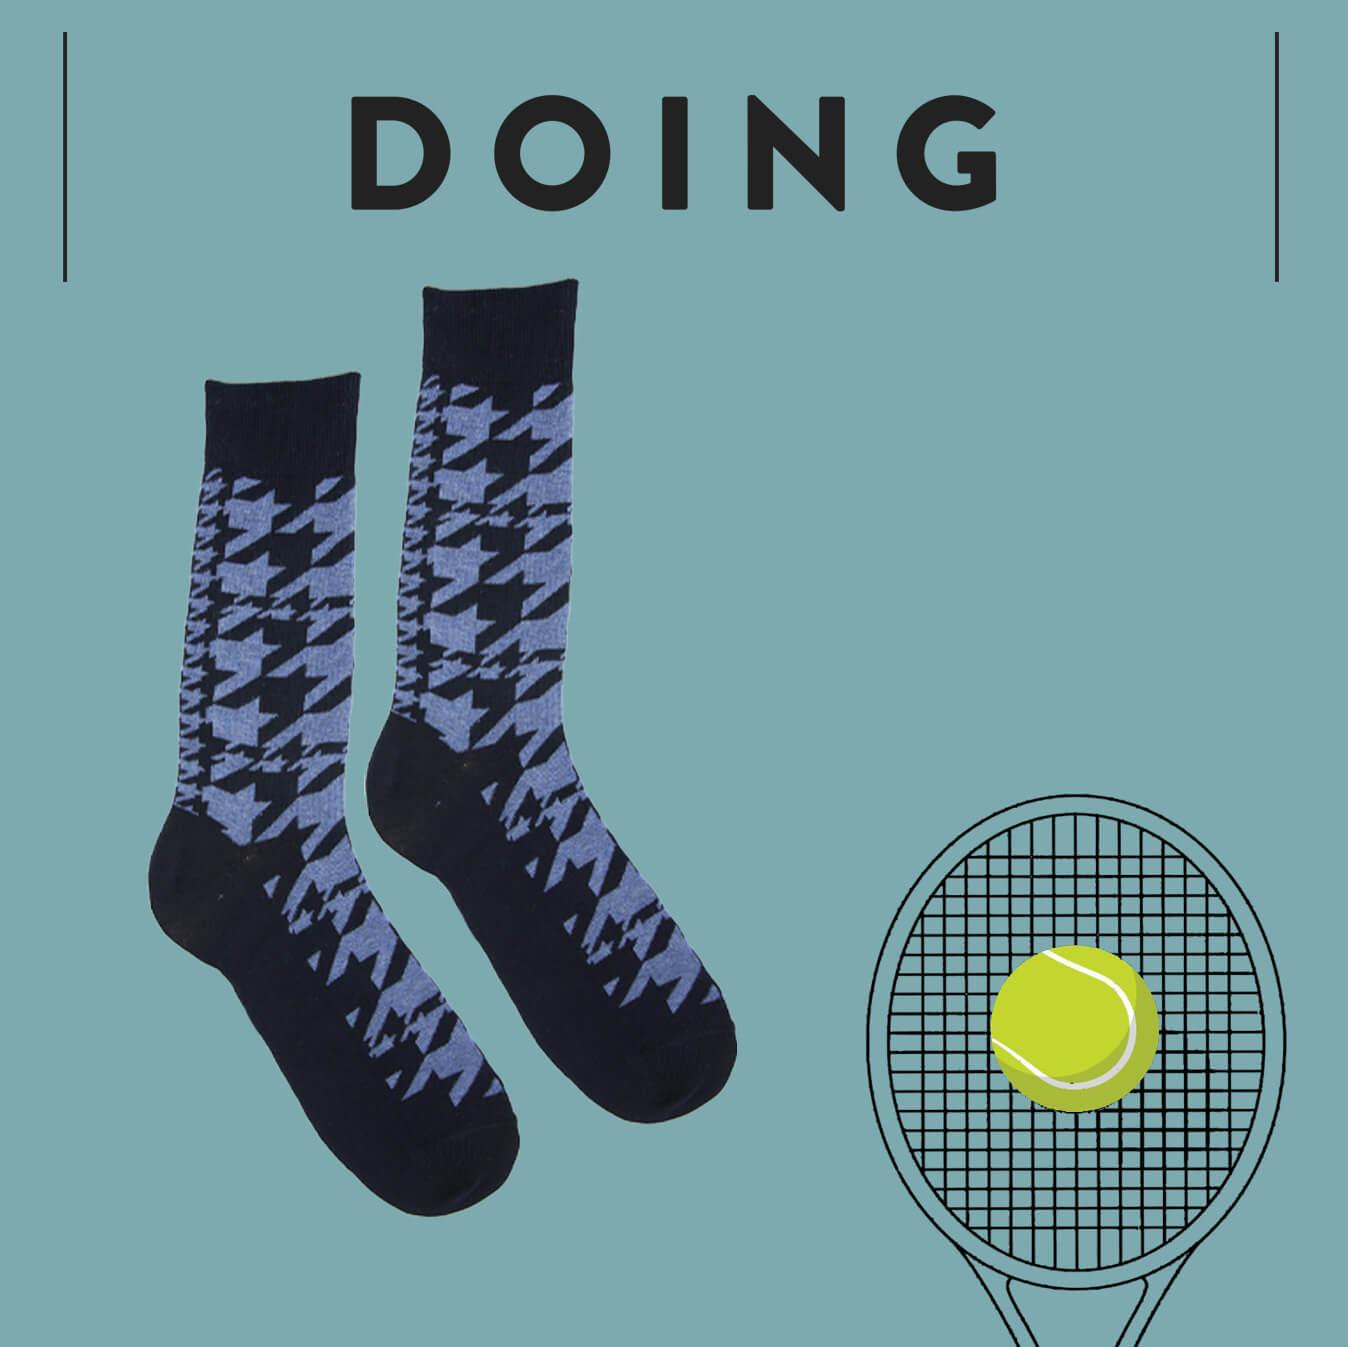 Distributore calze righe uomo - Doing